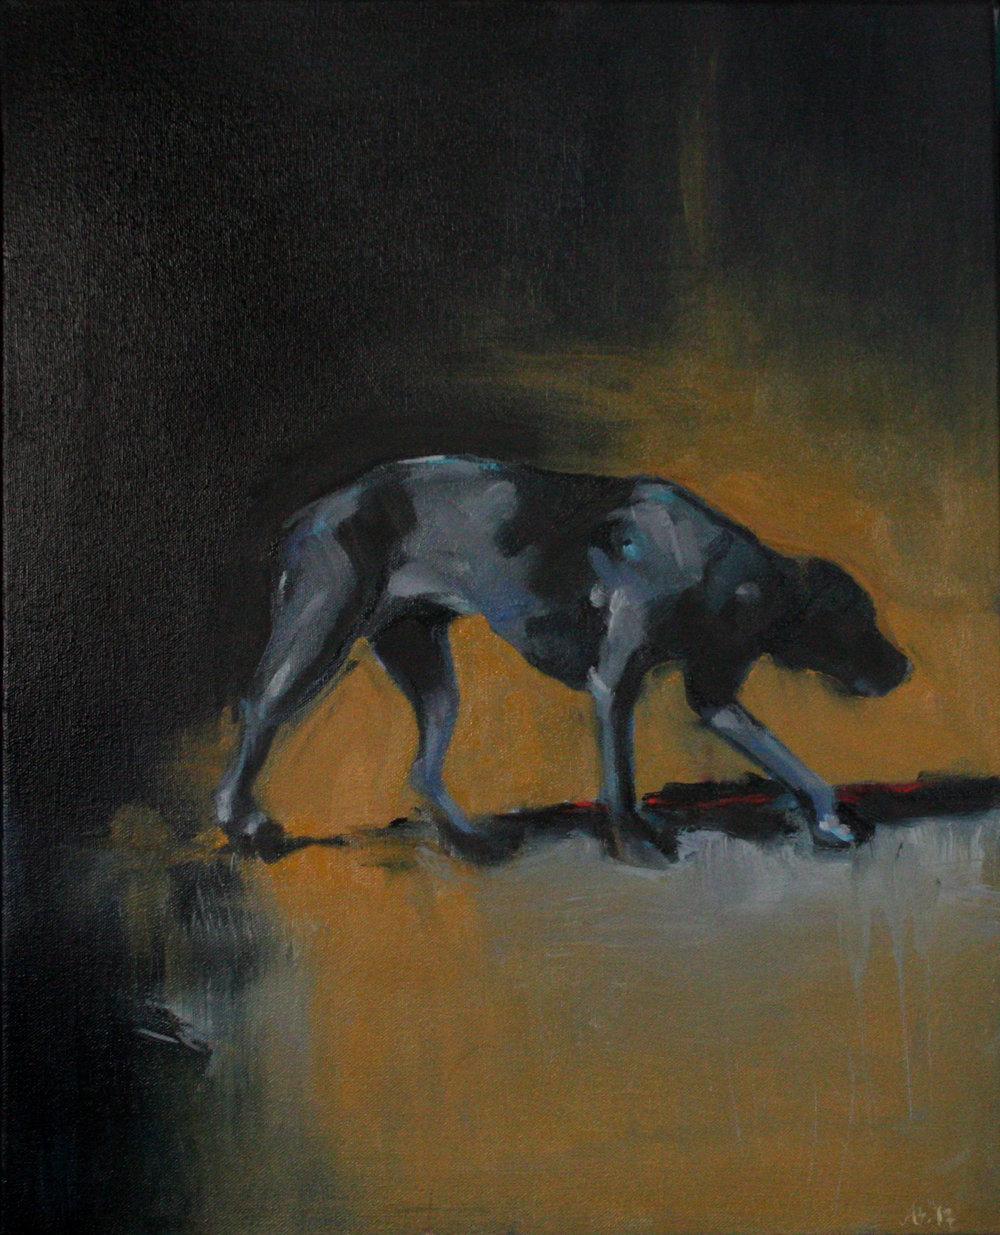 Study of a Black Dog #1